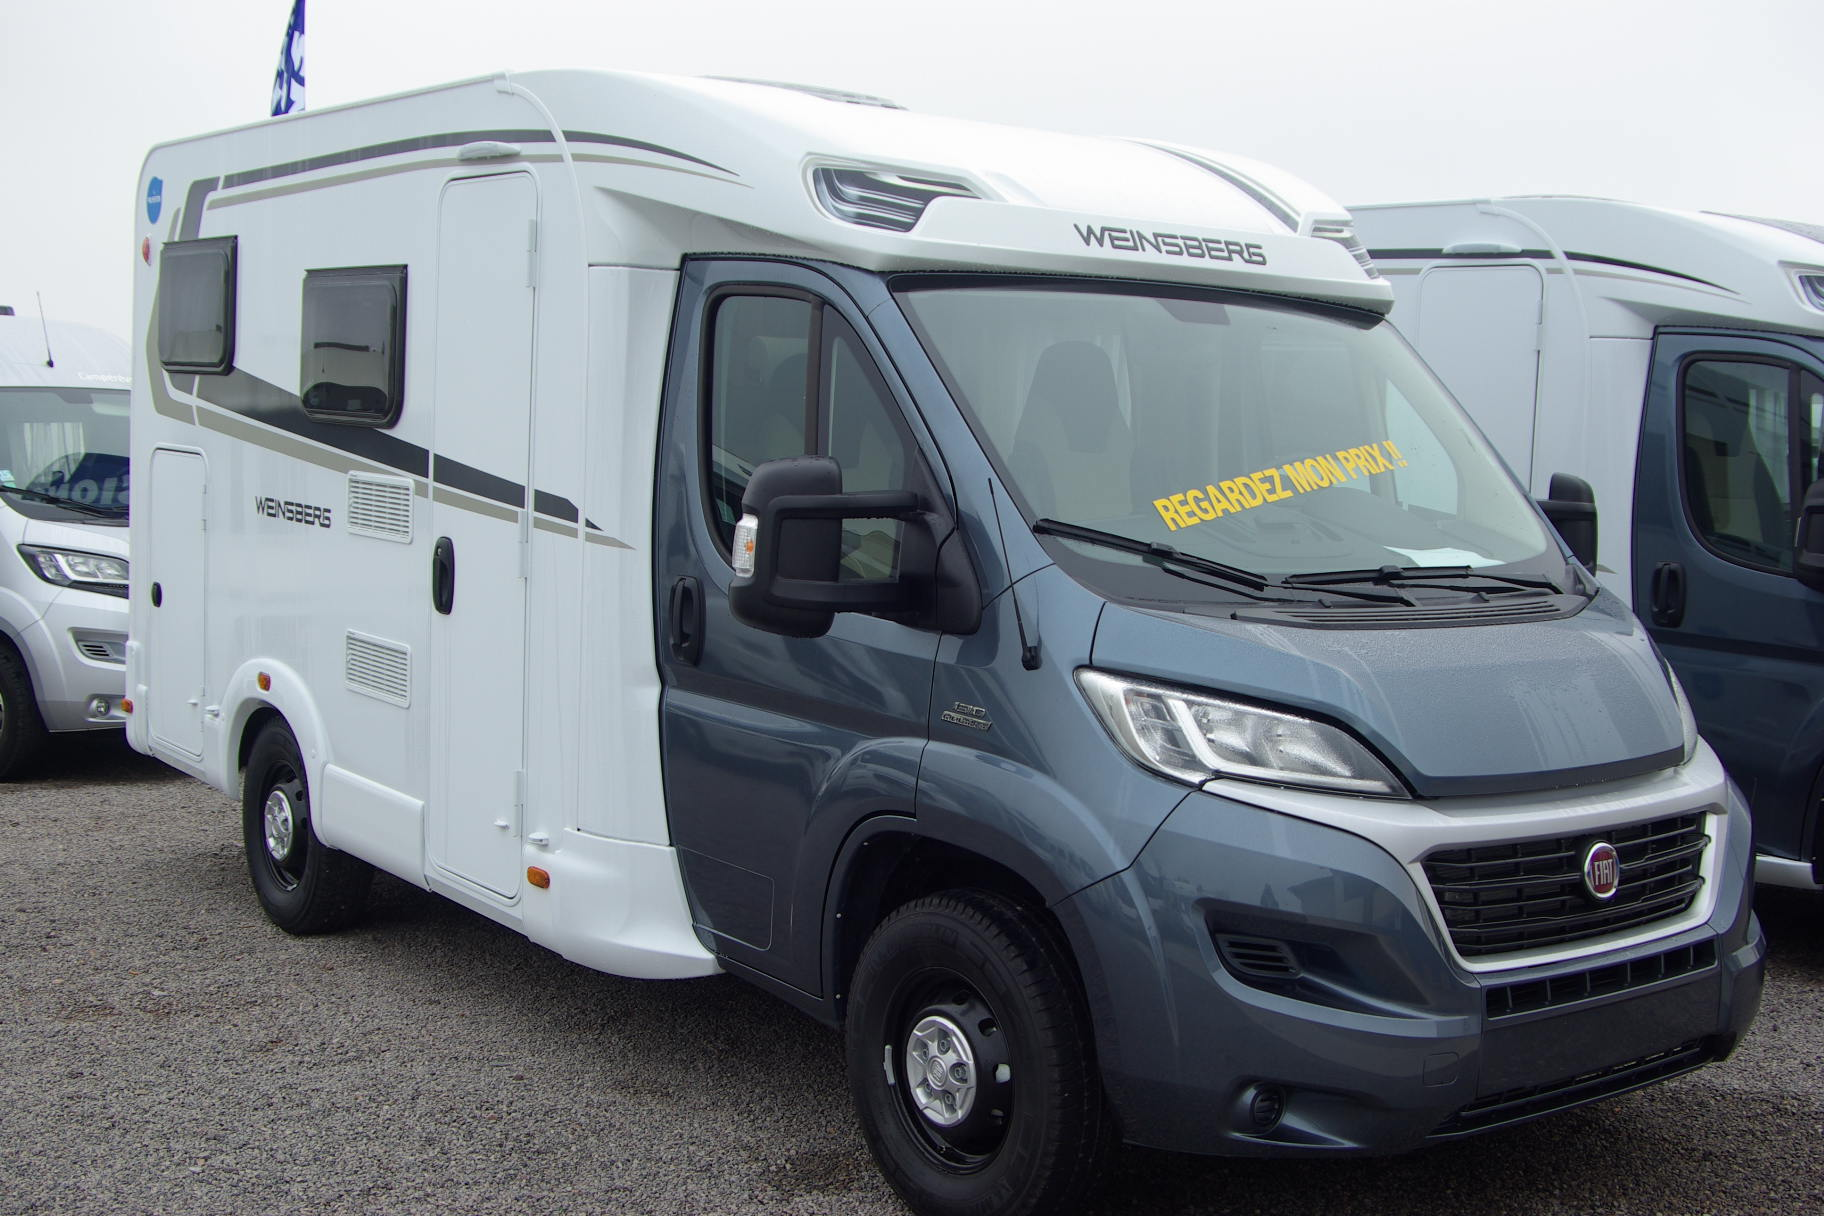 weinsberg caraloft 550mg neuf porteur fiat 2 3l 130cv camping car vendre en rhin 67 ref. Black Bedroom Furniture Sets. Home Design Ideas